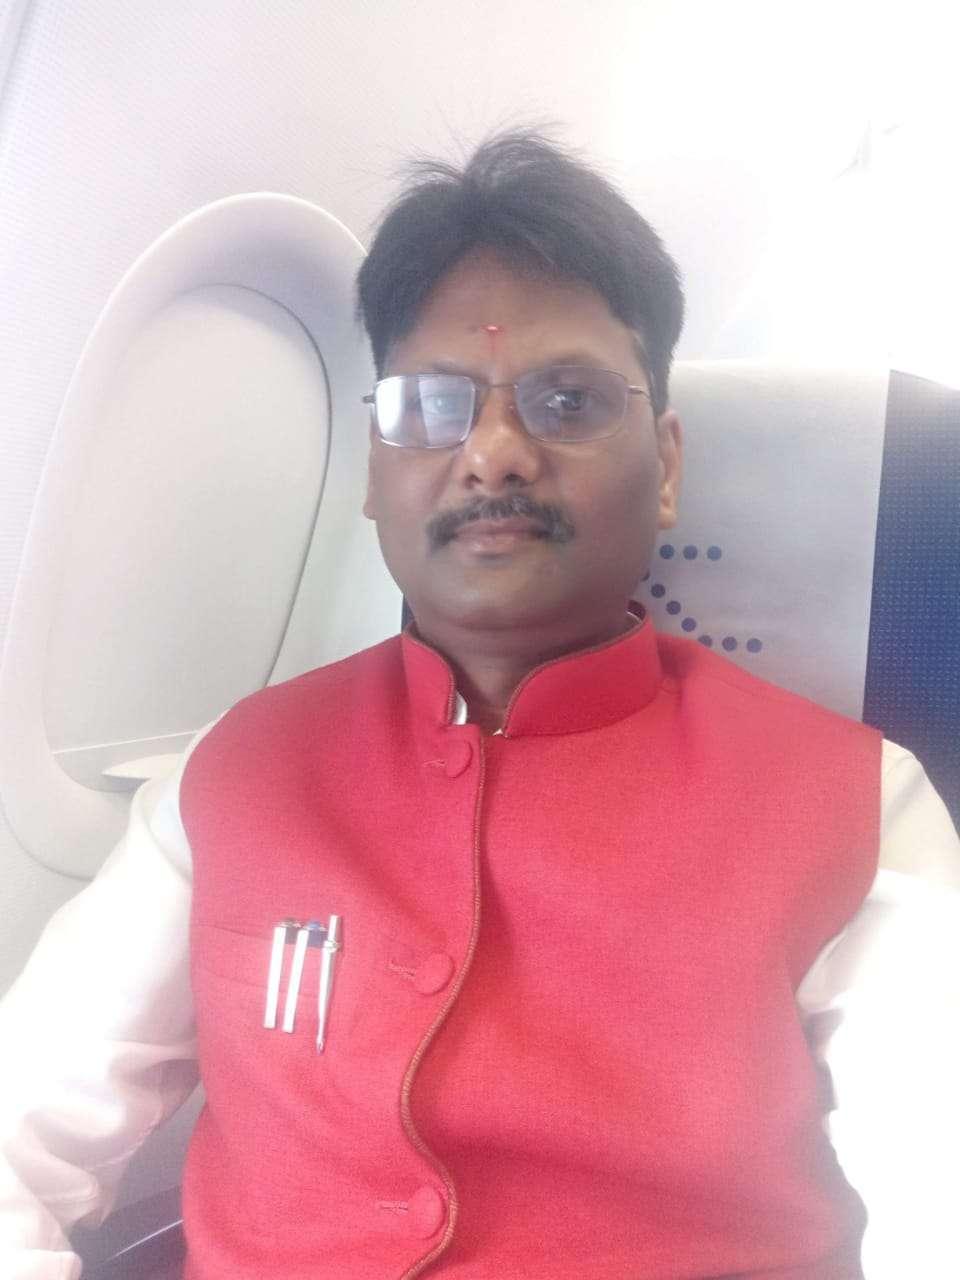 Kayastha को राजनीति में मिले वाजिब प्रतिनिधित्व : Yogendra Srivastava